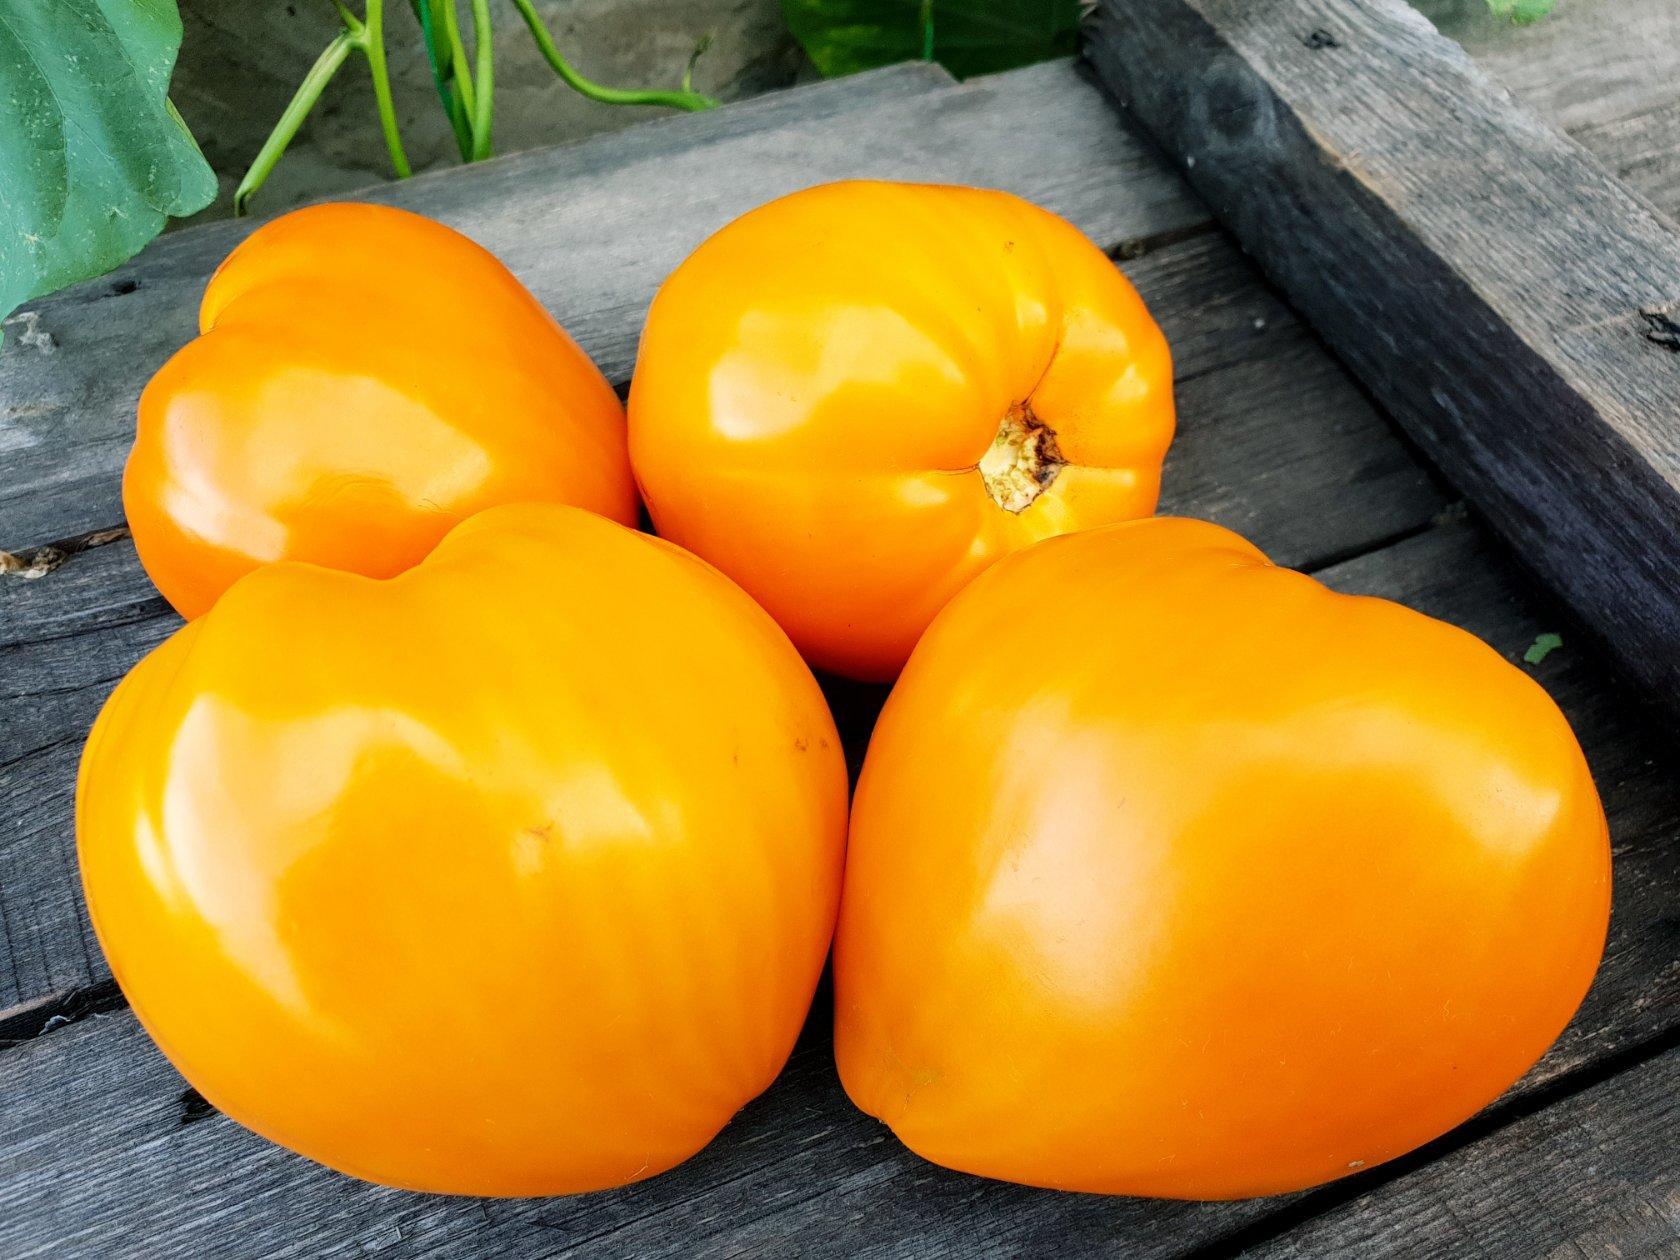 томаты ночная свеча описание и характеристика